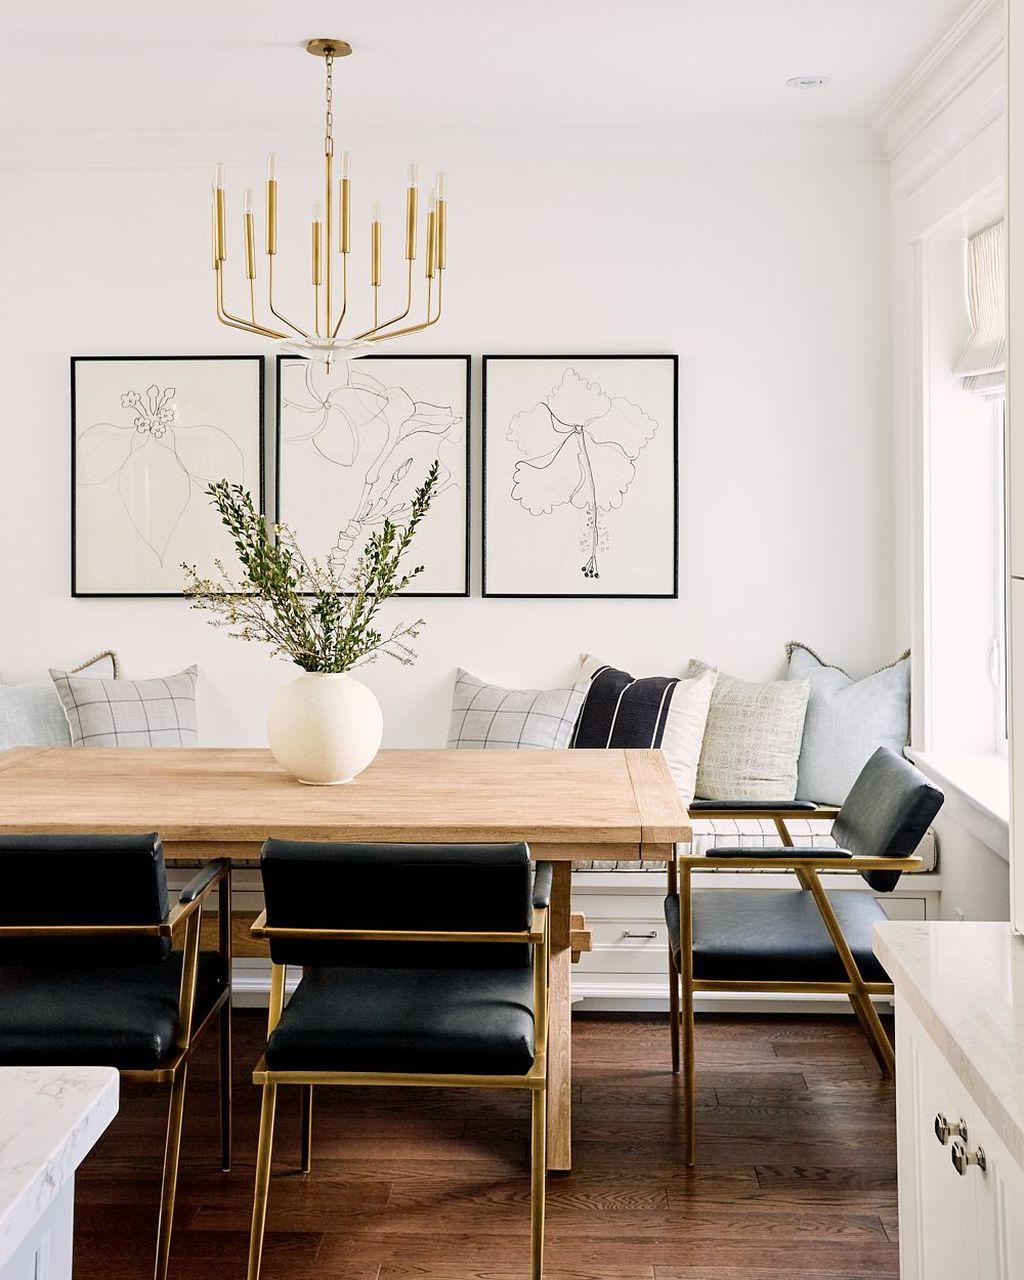 Popular Modern Dining Room Design Ideas You Should Copy 08